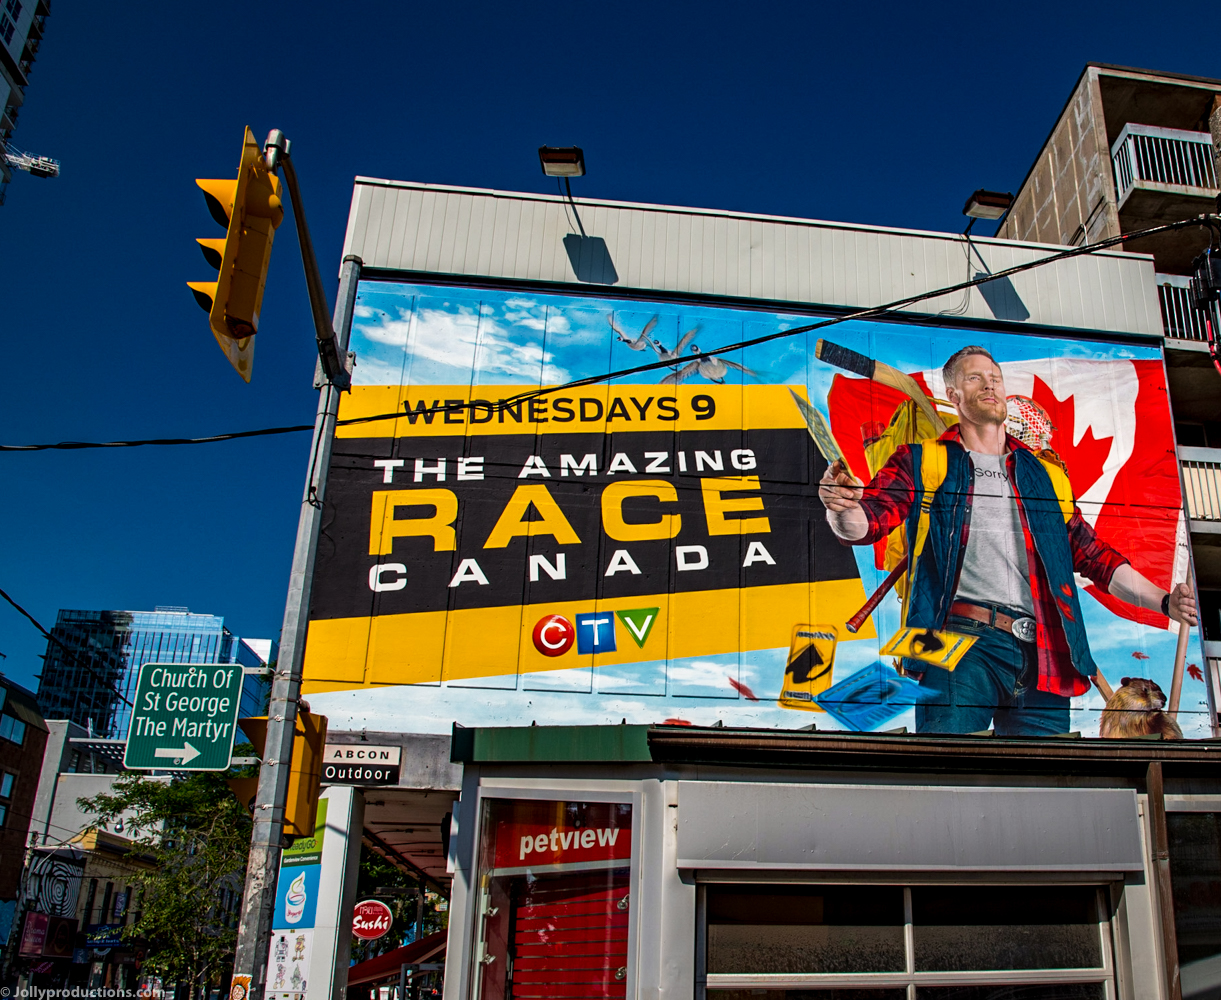 Amazing Race Canada mural